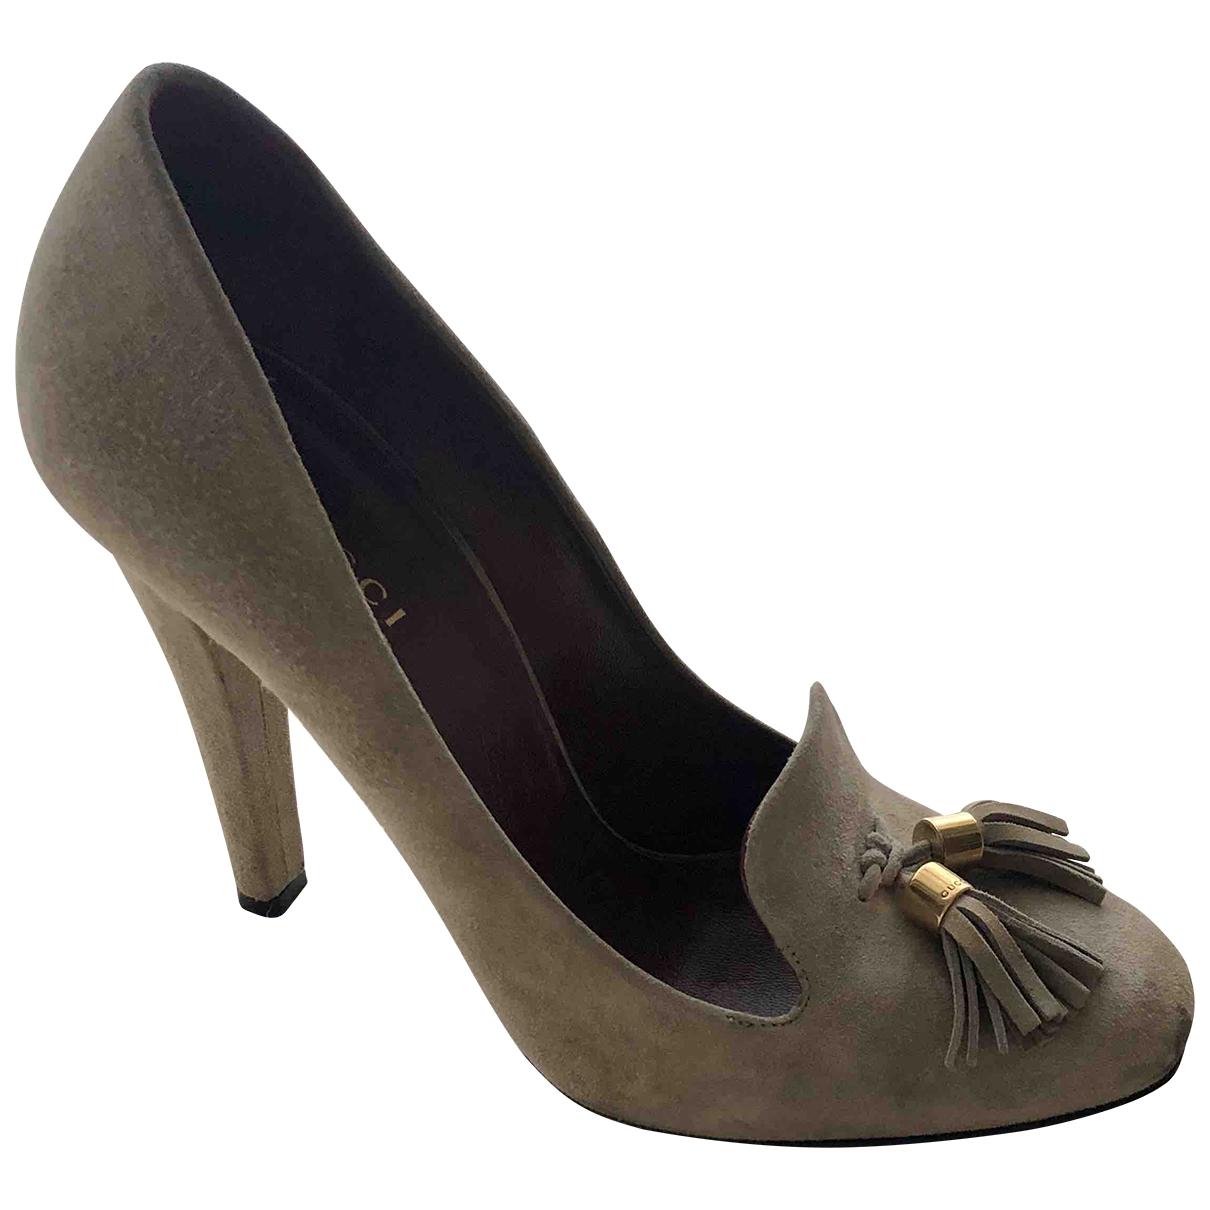 Gucci \N Grey Suede Heels for Women 36.5 IT